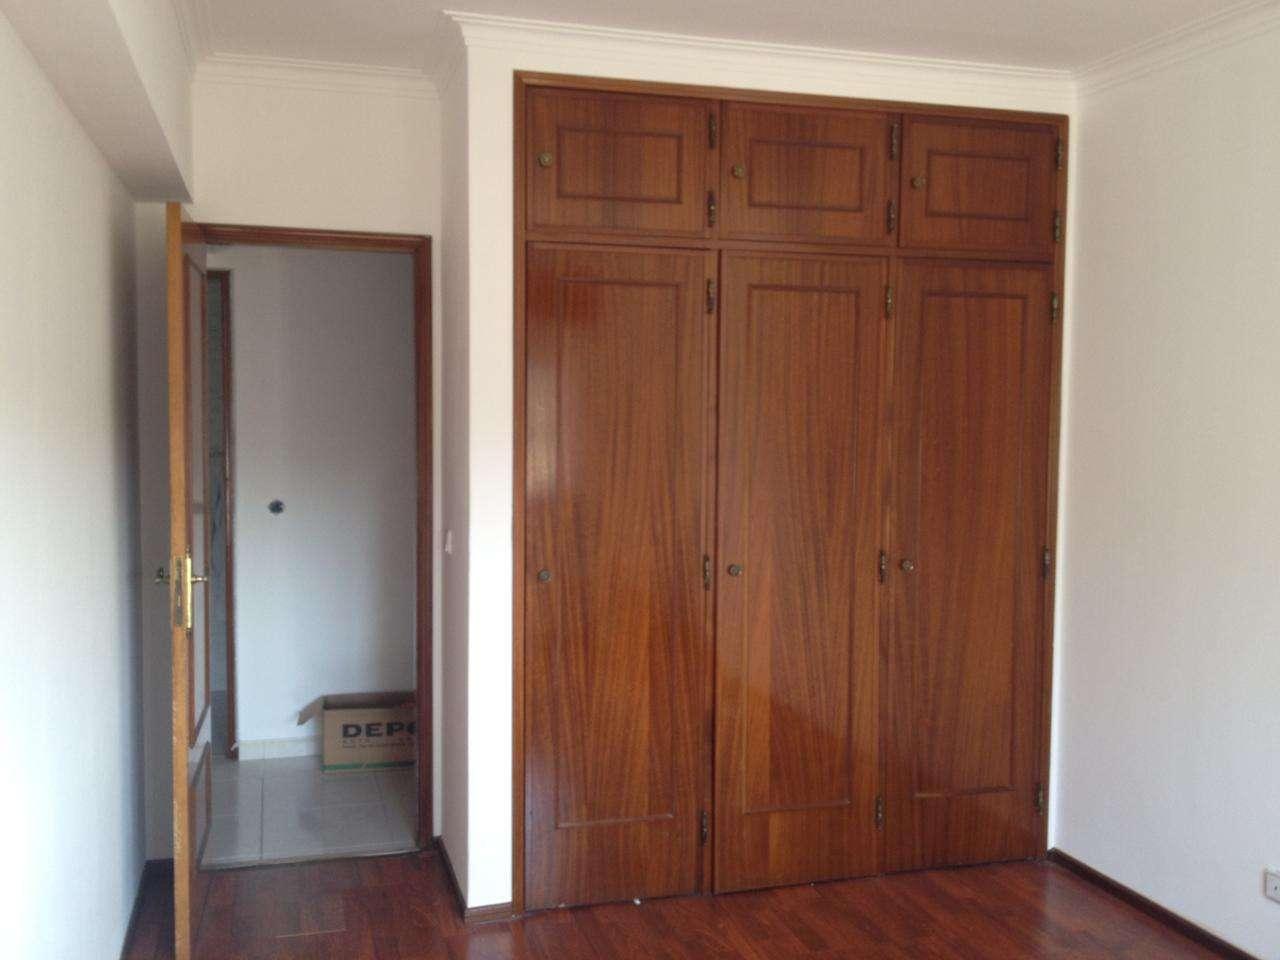 Apartamento para comprar, Rio de Mouro, Lisboa - Foto 19